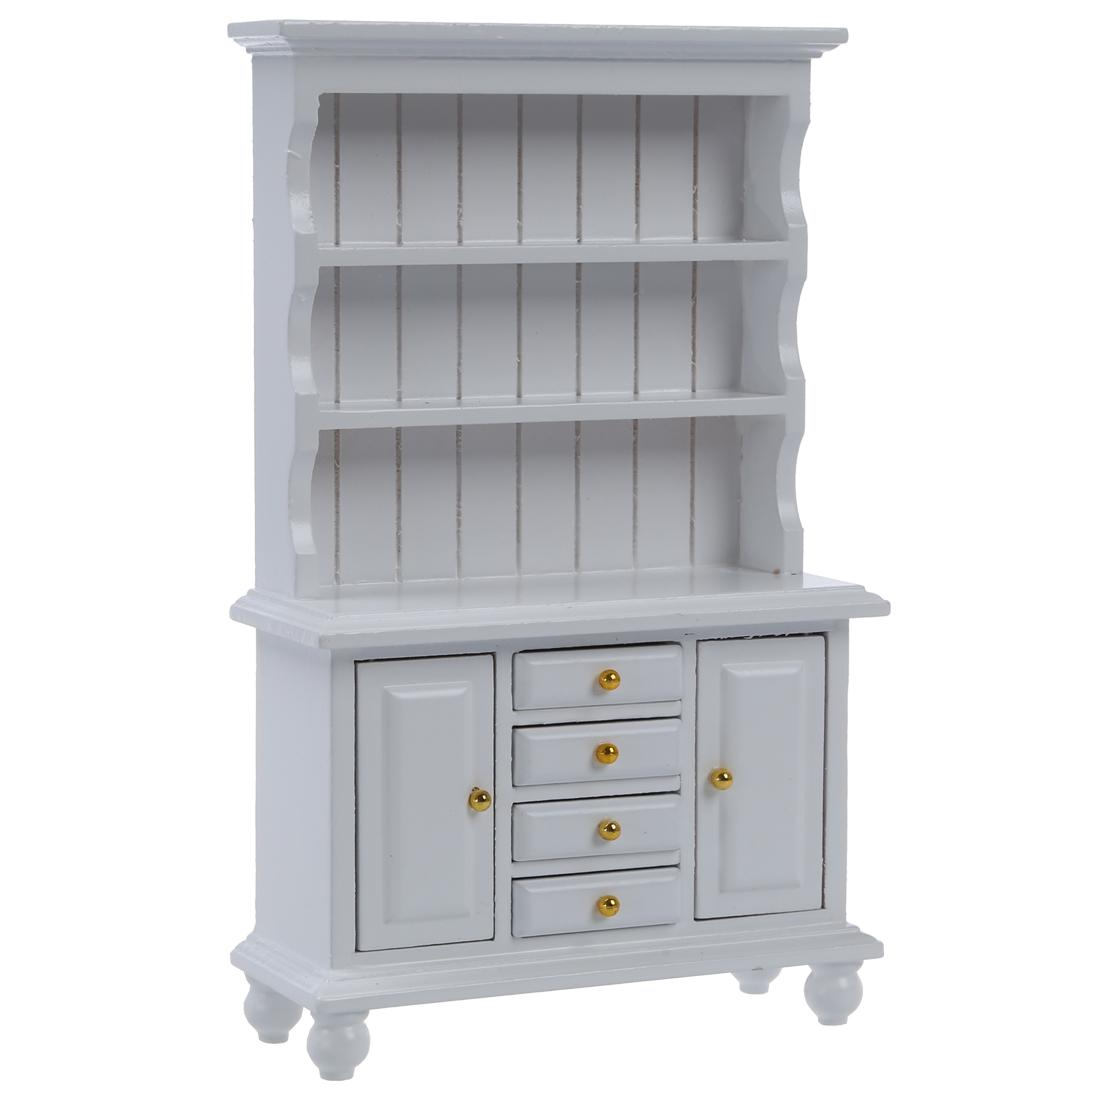 1/12 Dollhouse Miniature Furniture Multifunction Wood